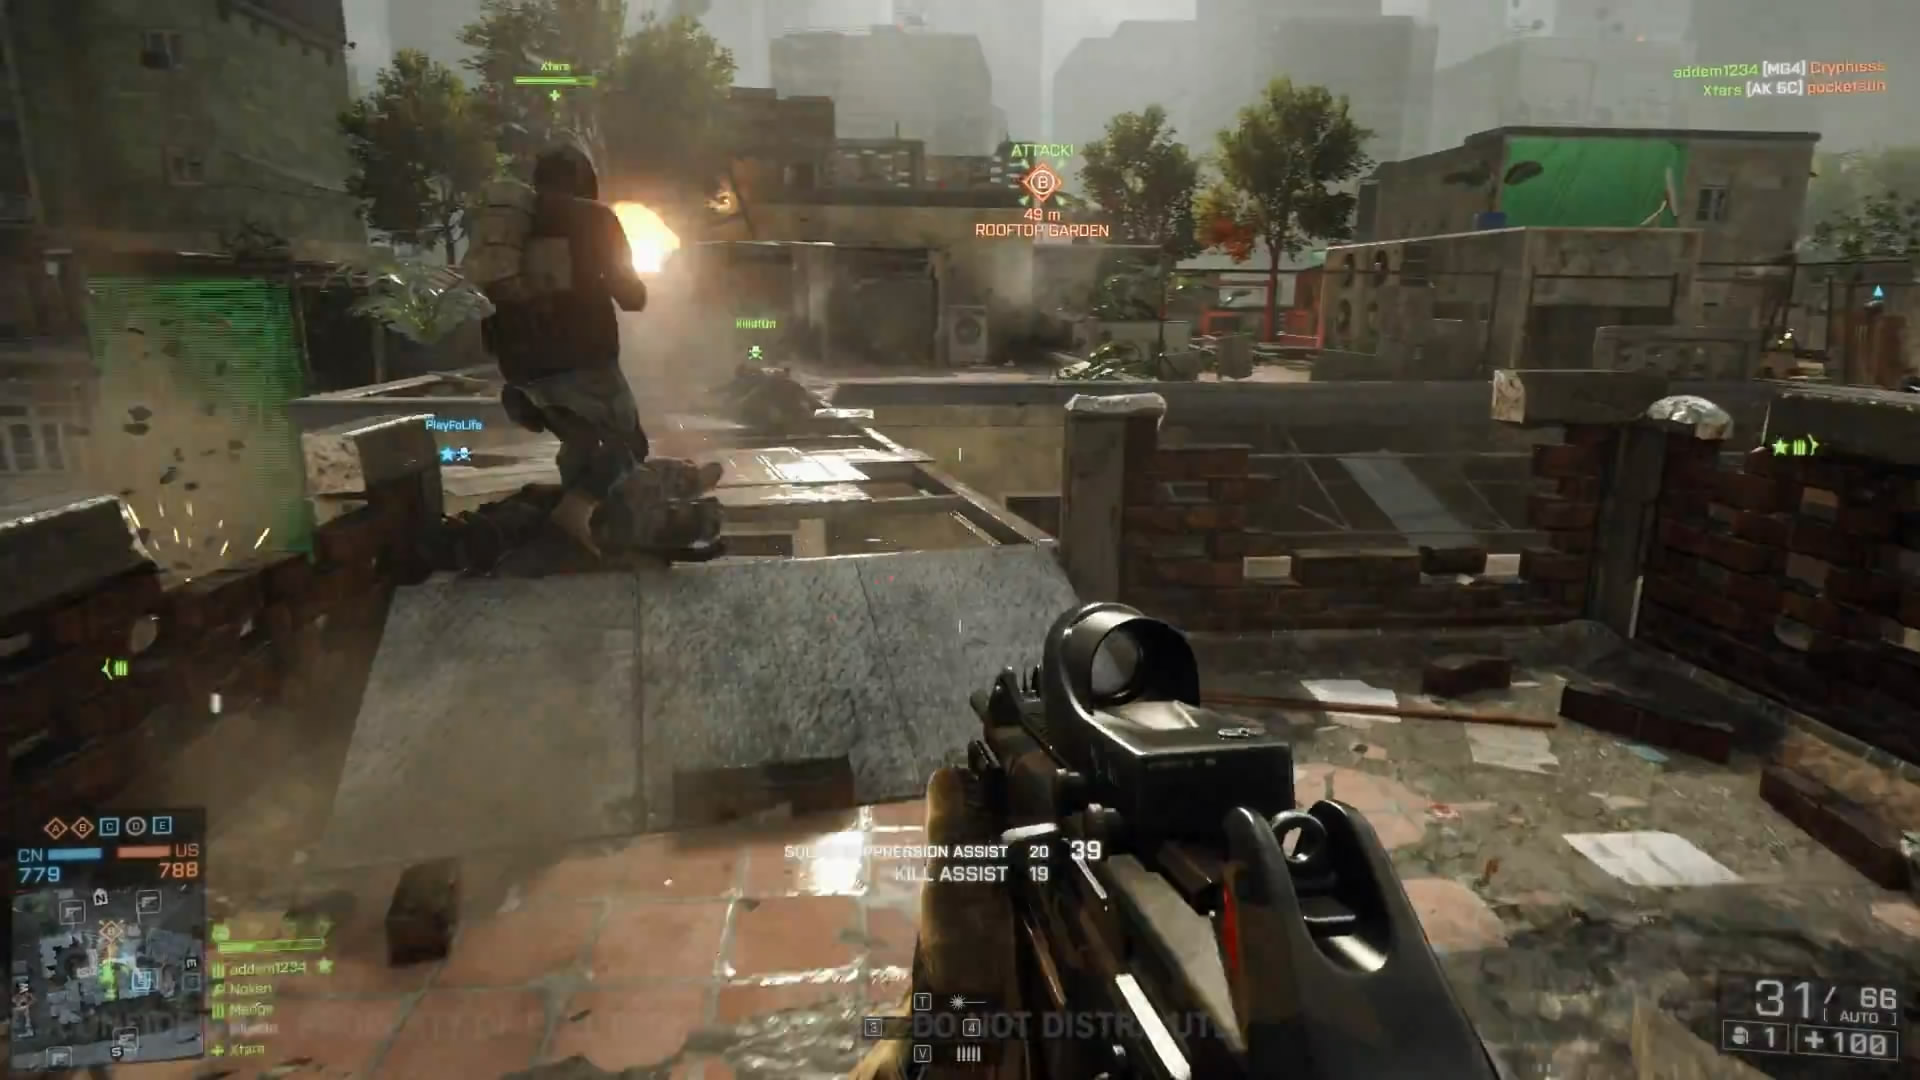 Battlefield-Hardline-Real-Gameplay.mp4_snapshot_00.27_2014.05.28_12.47.17